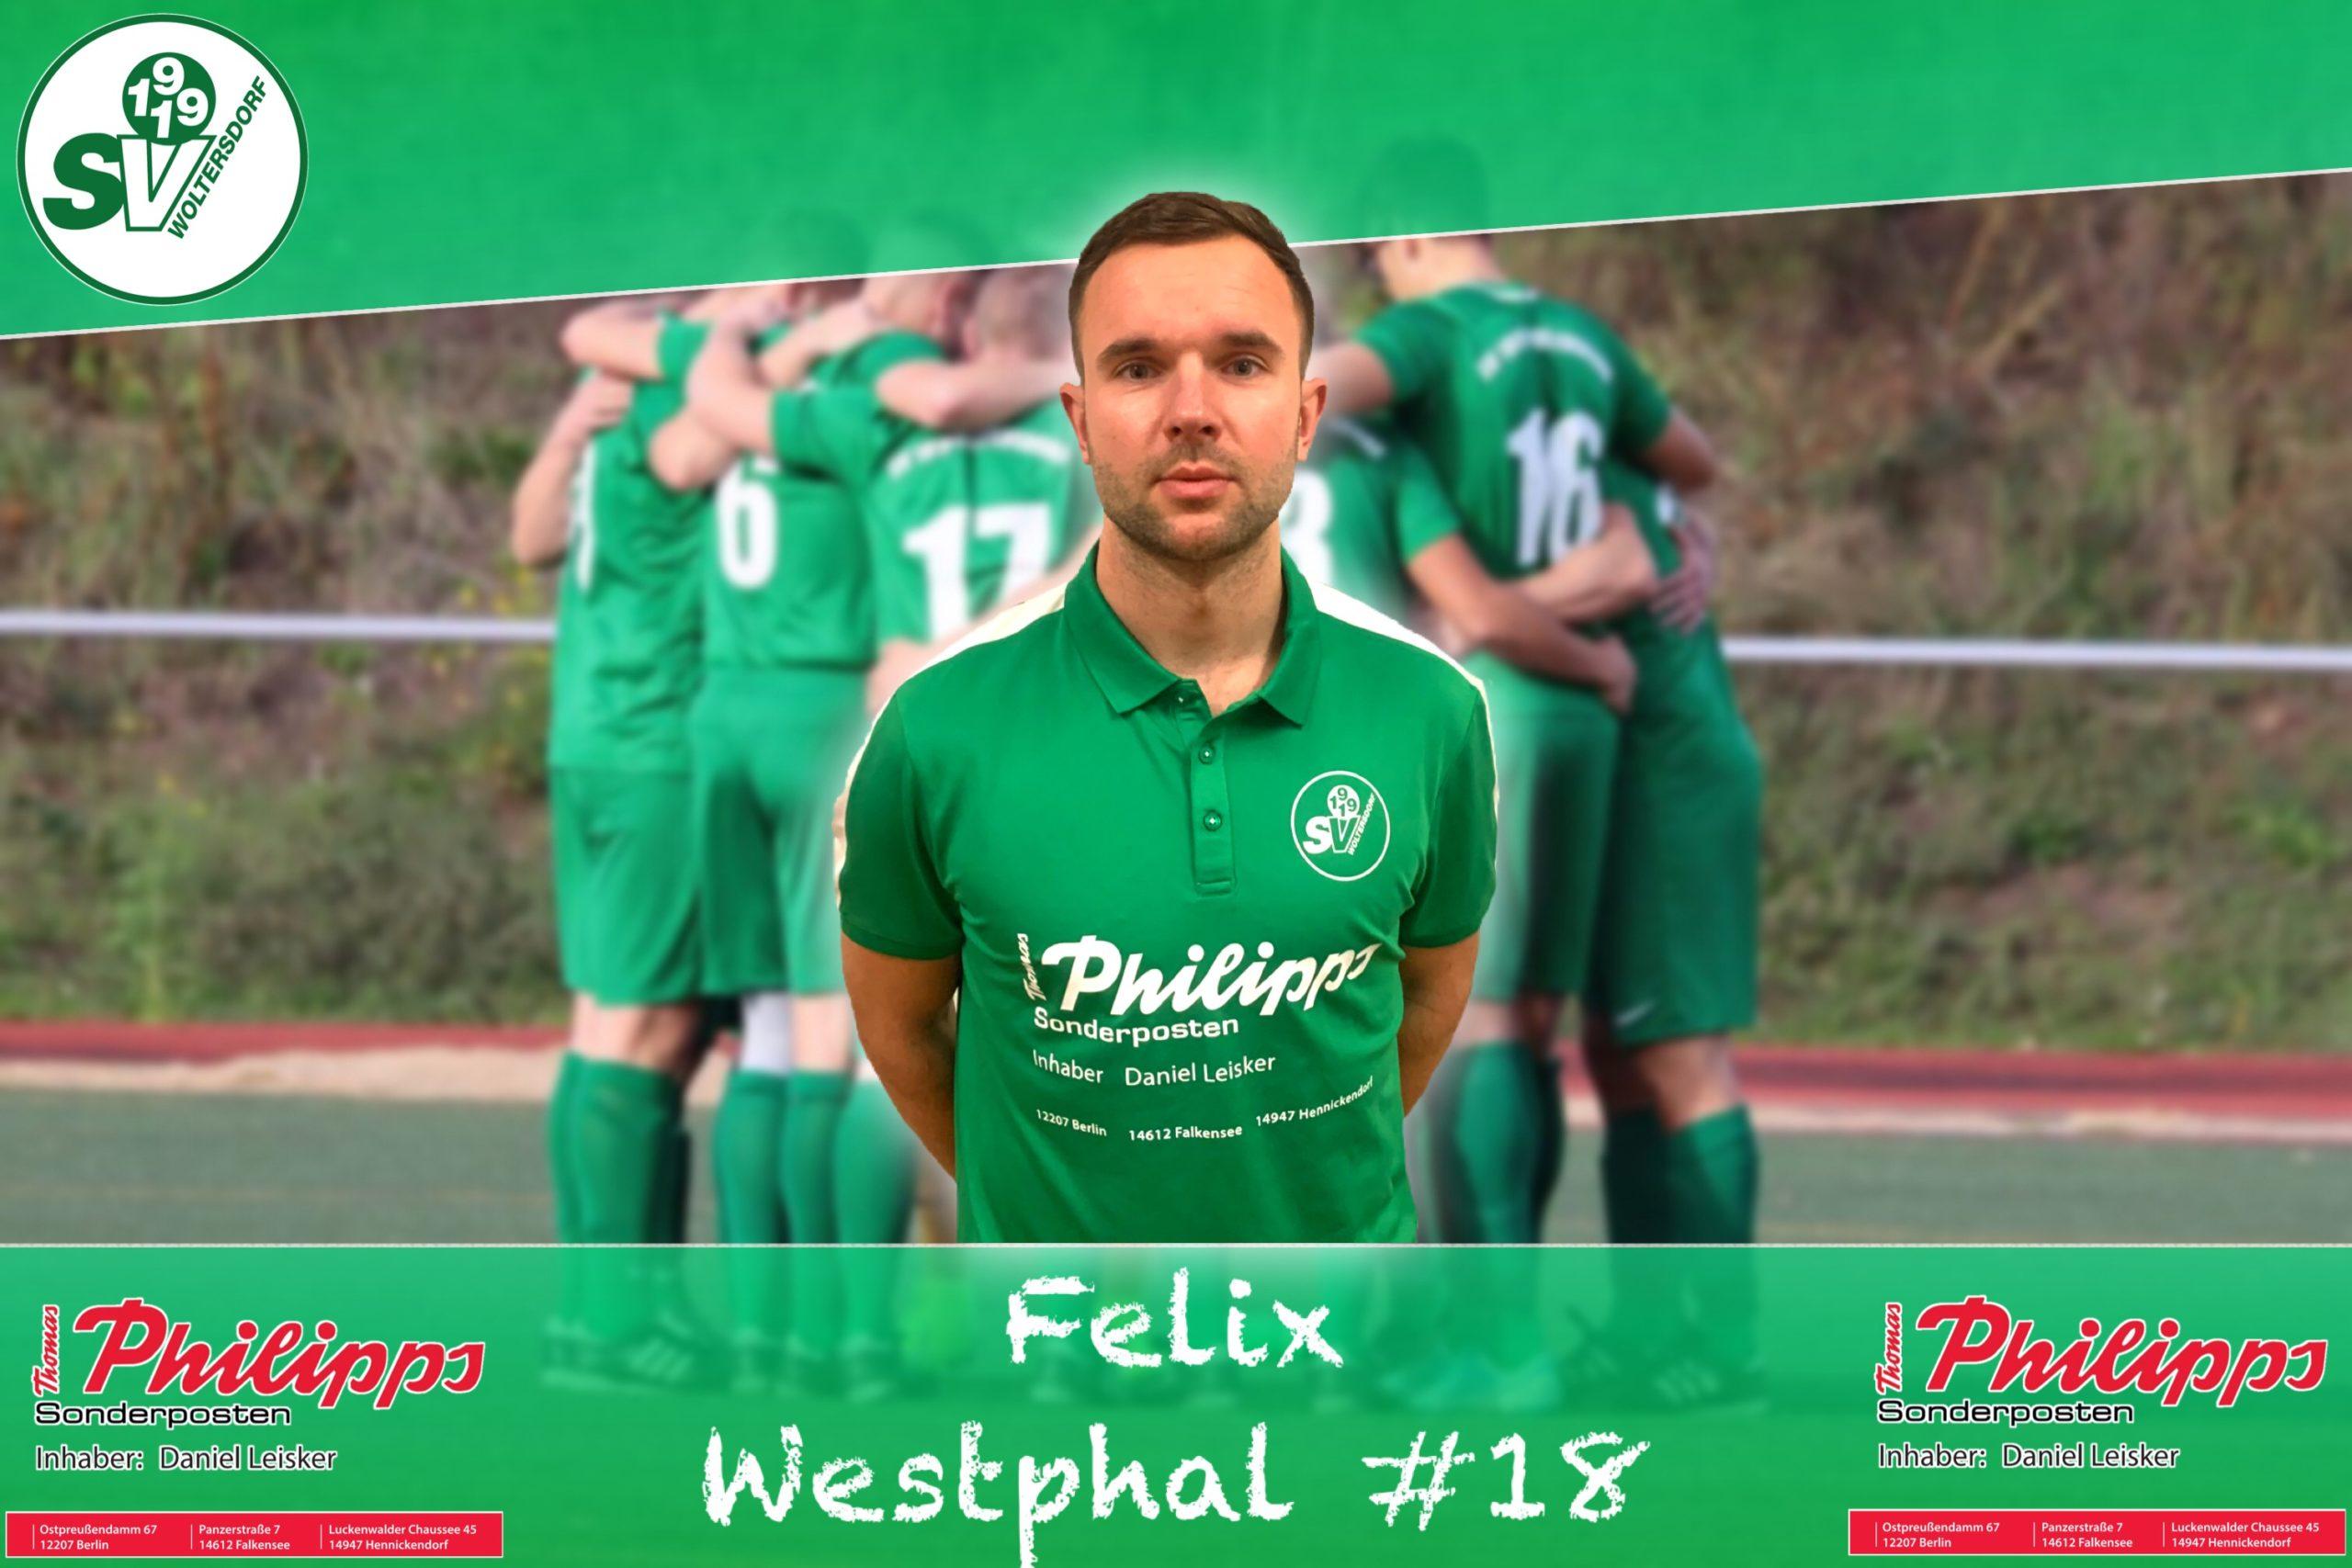 Felix Westphal